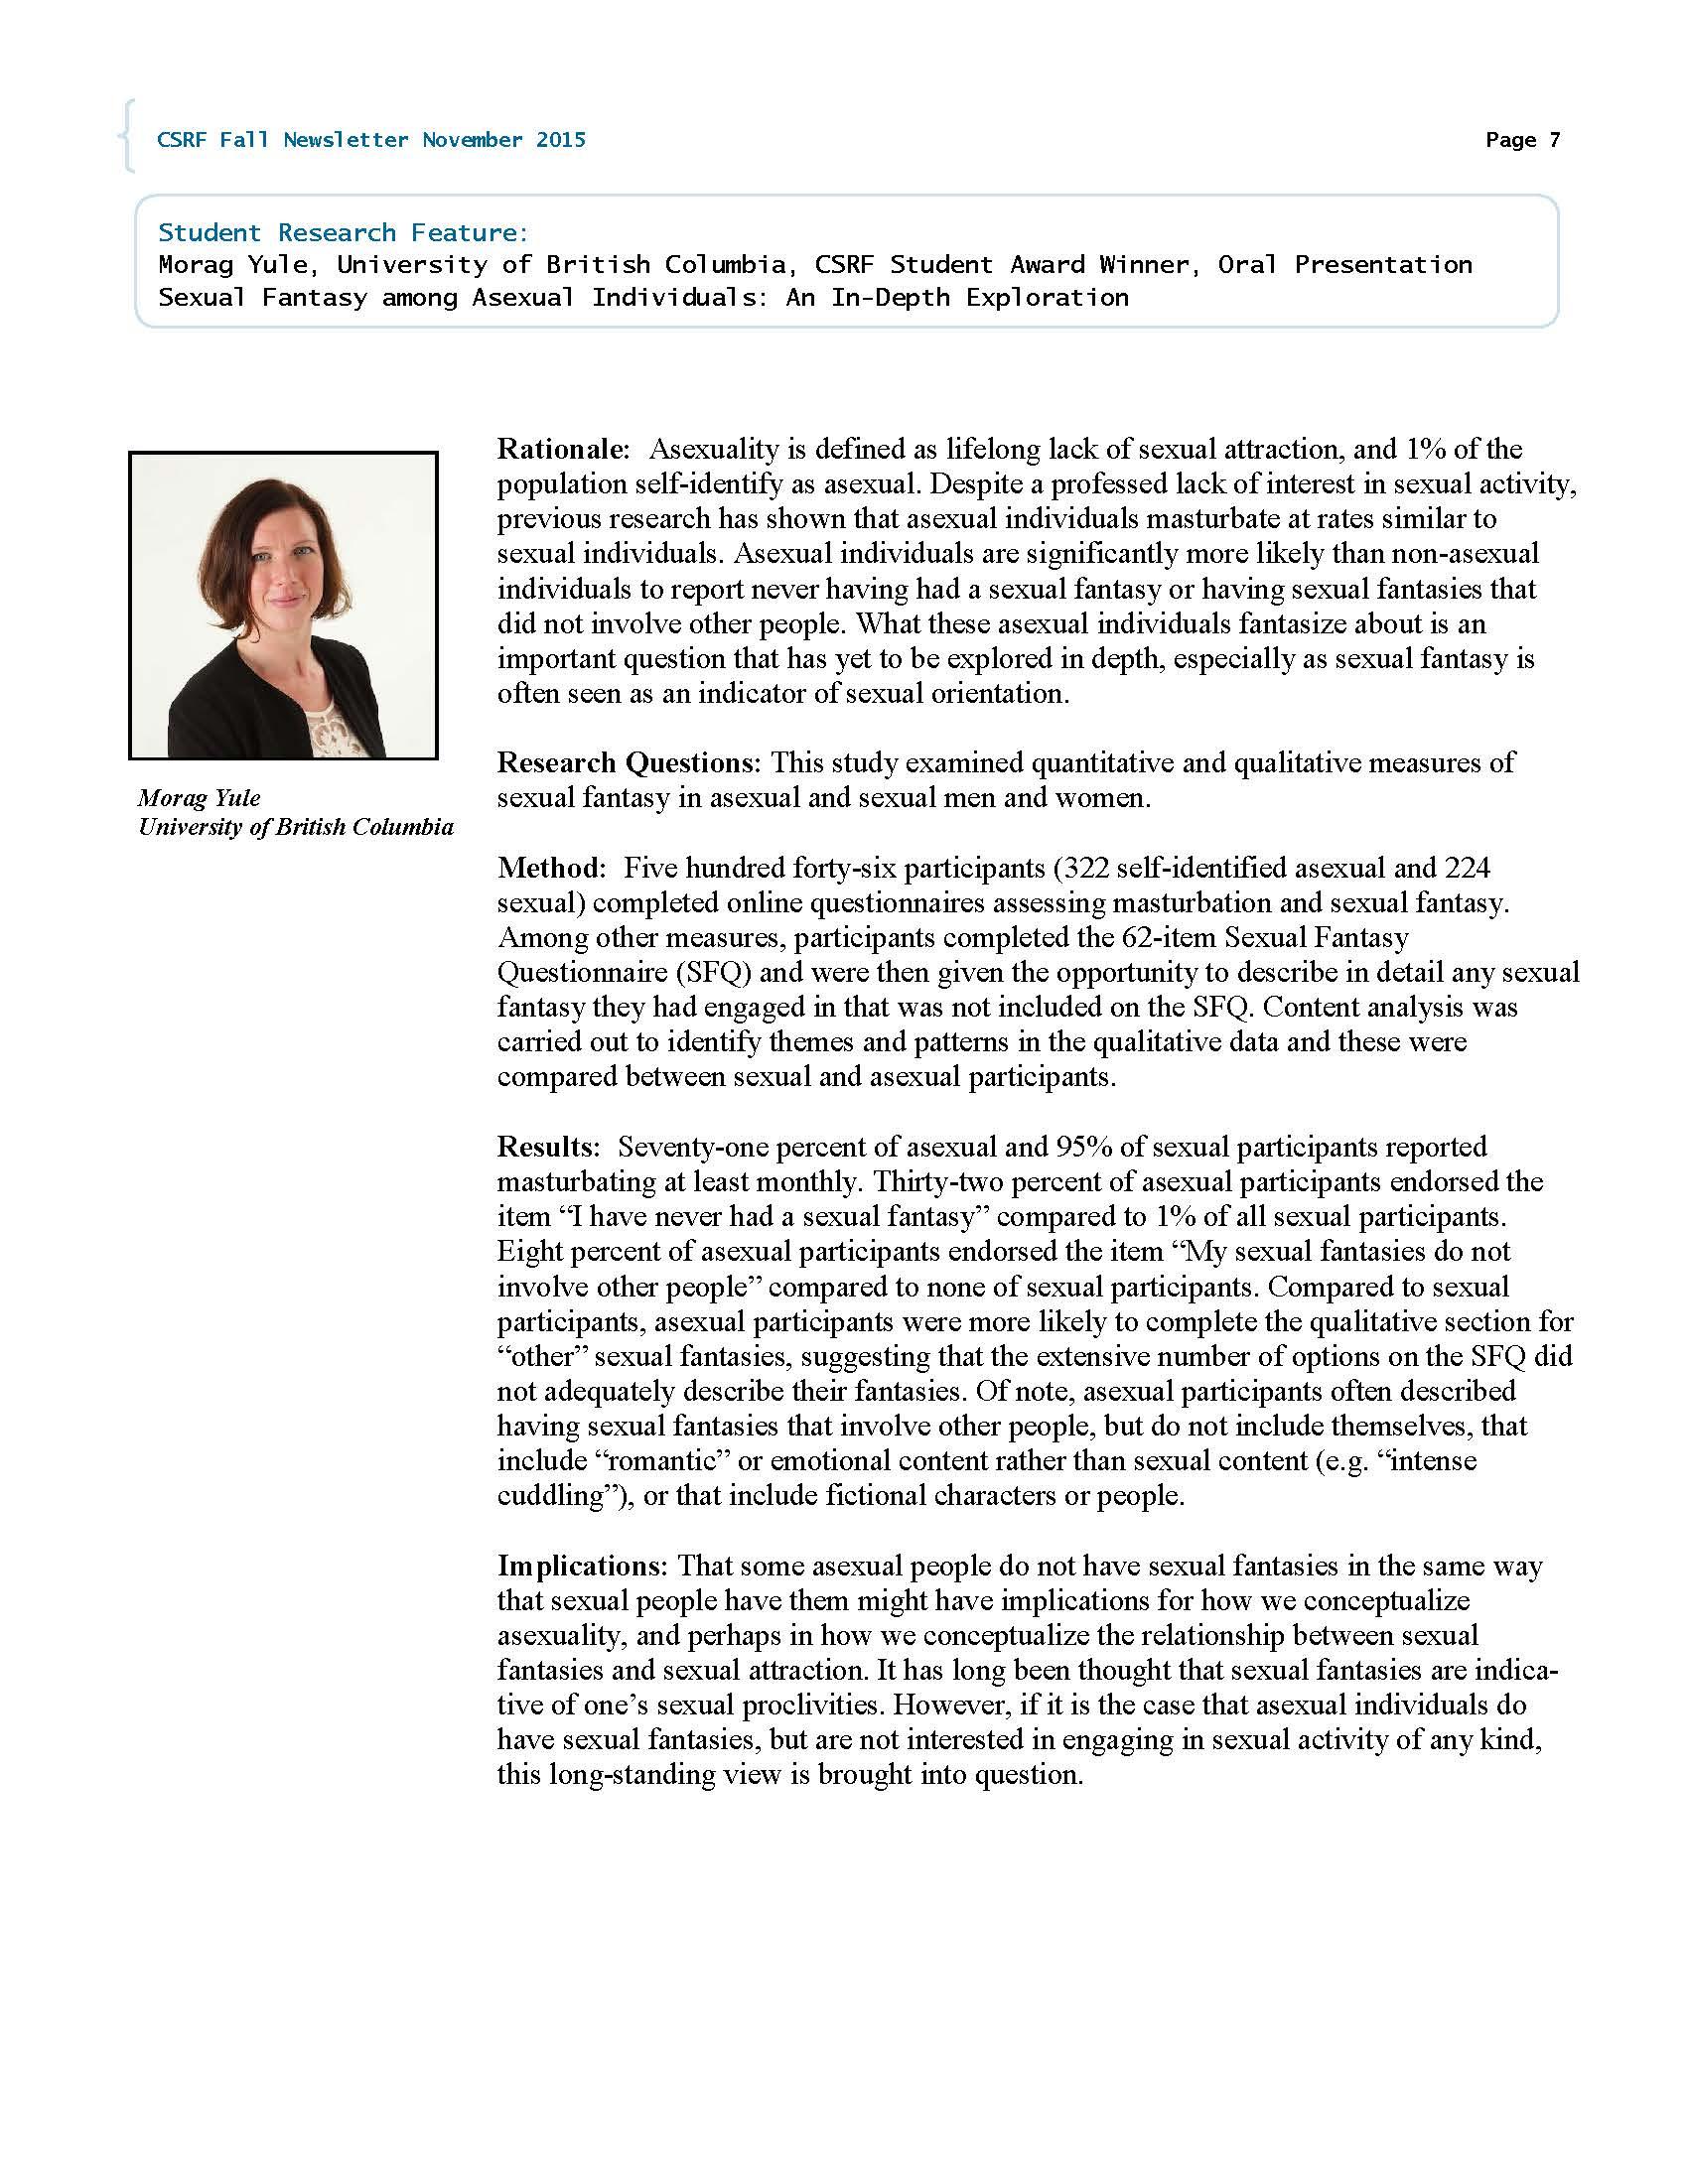 CSRF Fall Newsletter 2015_Page_07.jpg